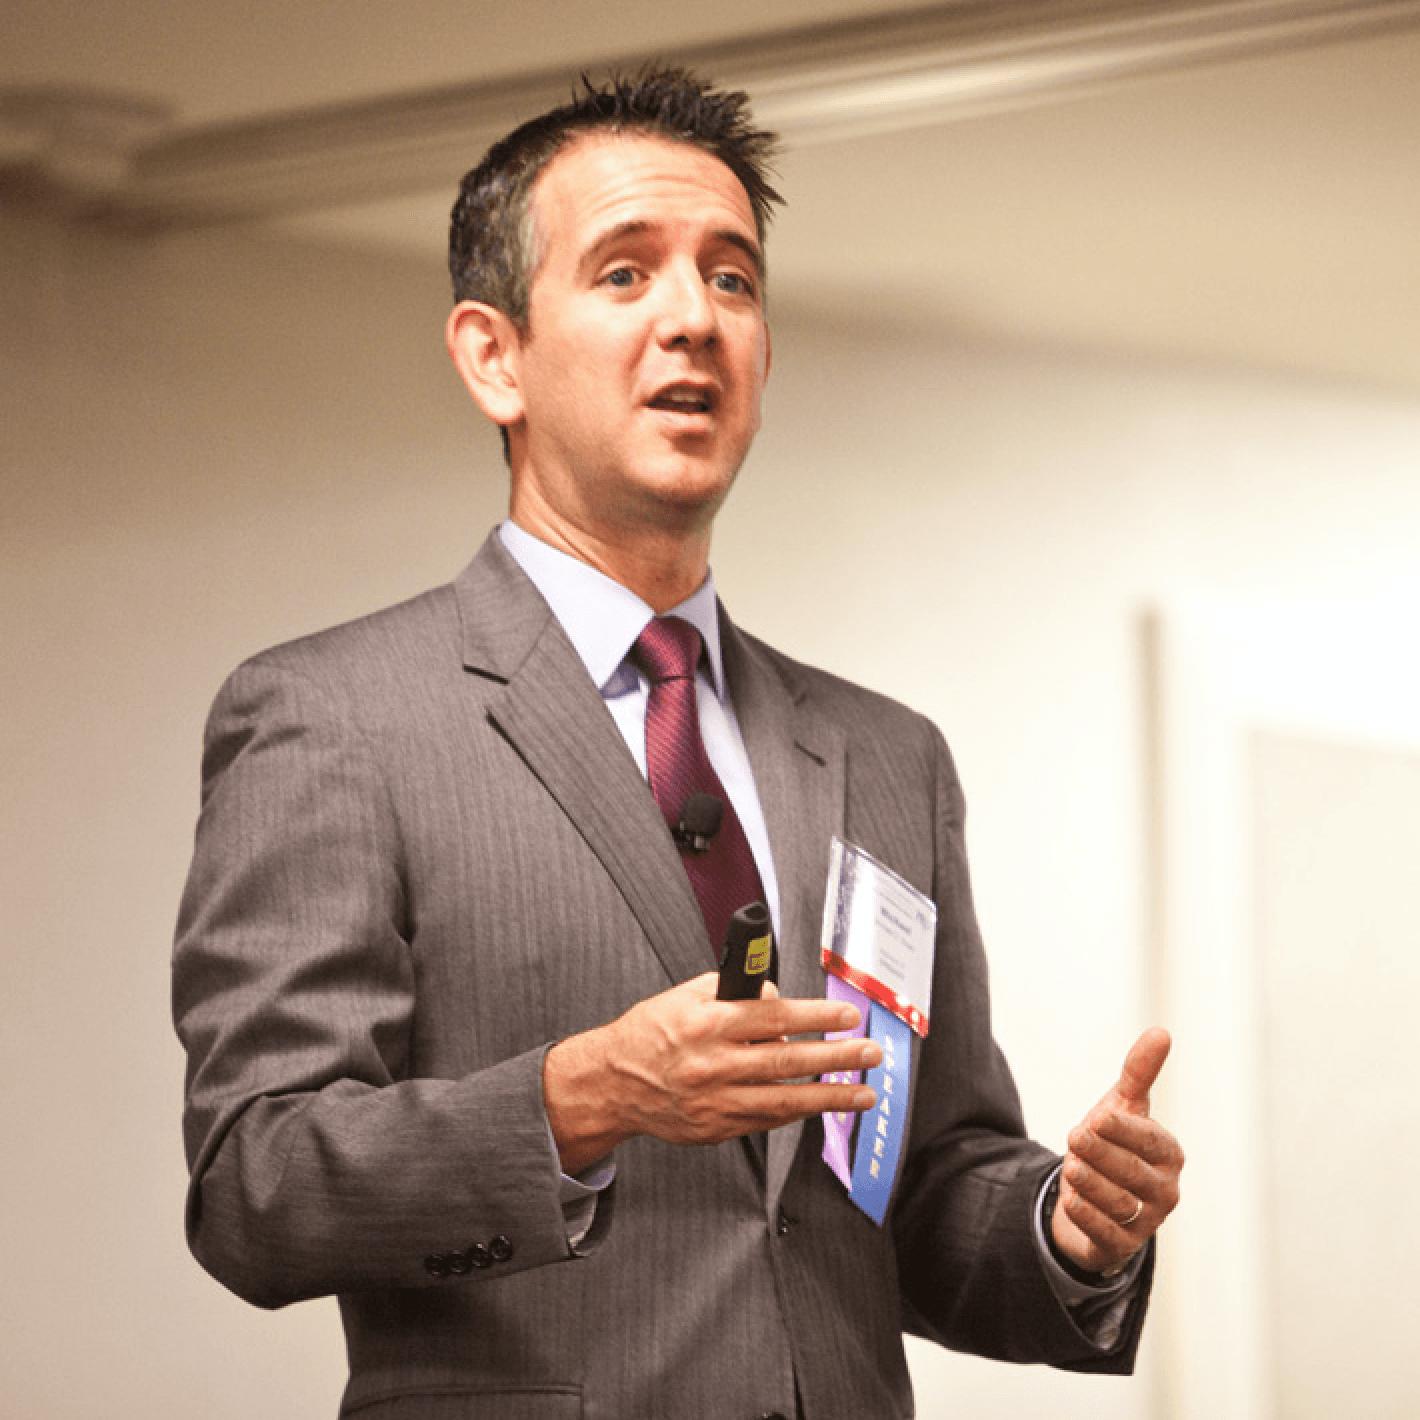 Media Relations Pro - Michael Smart